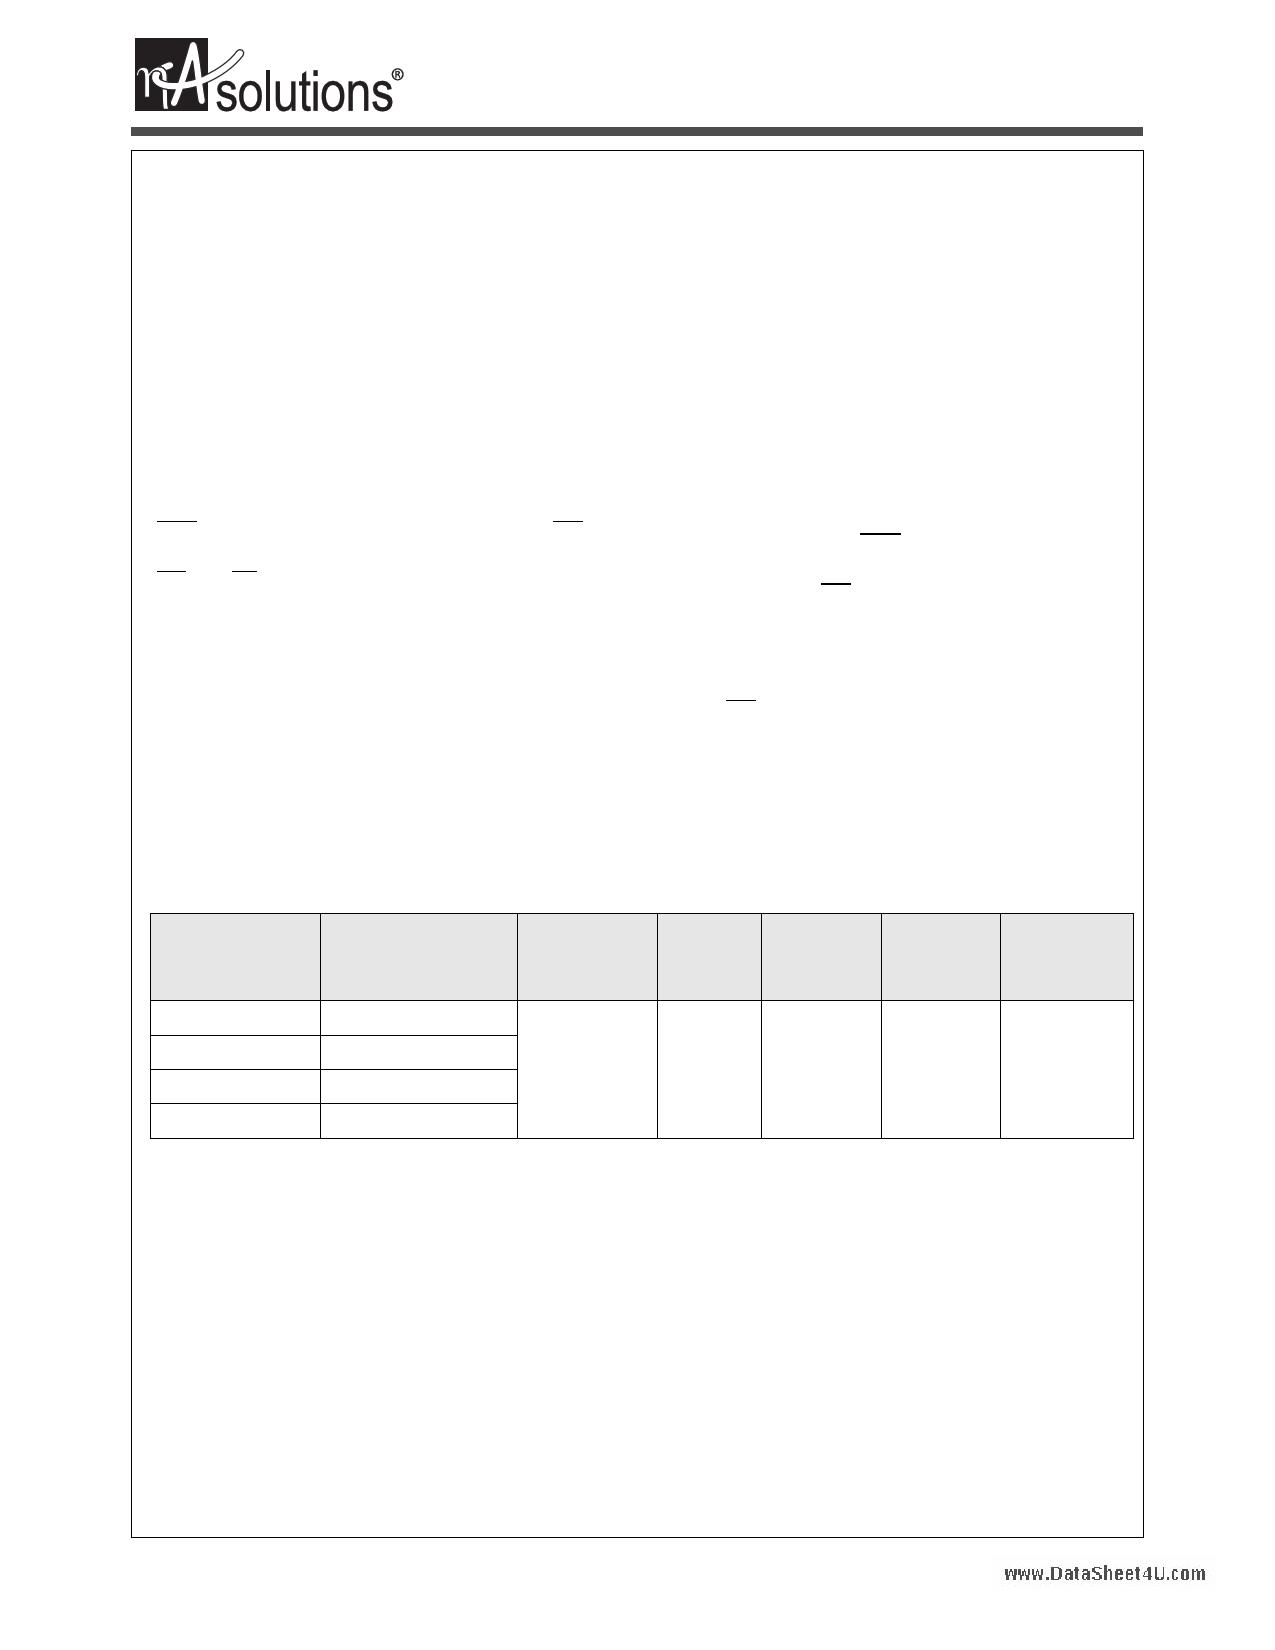 N02L163WC2A datasheet